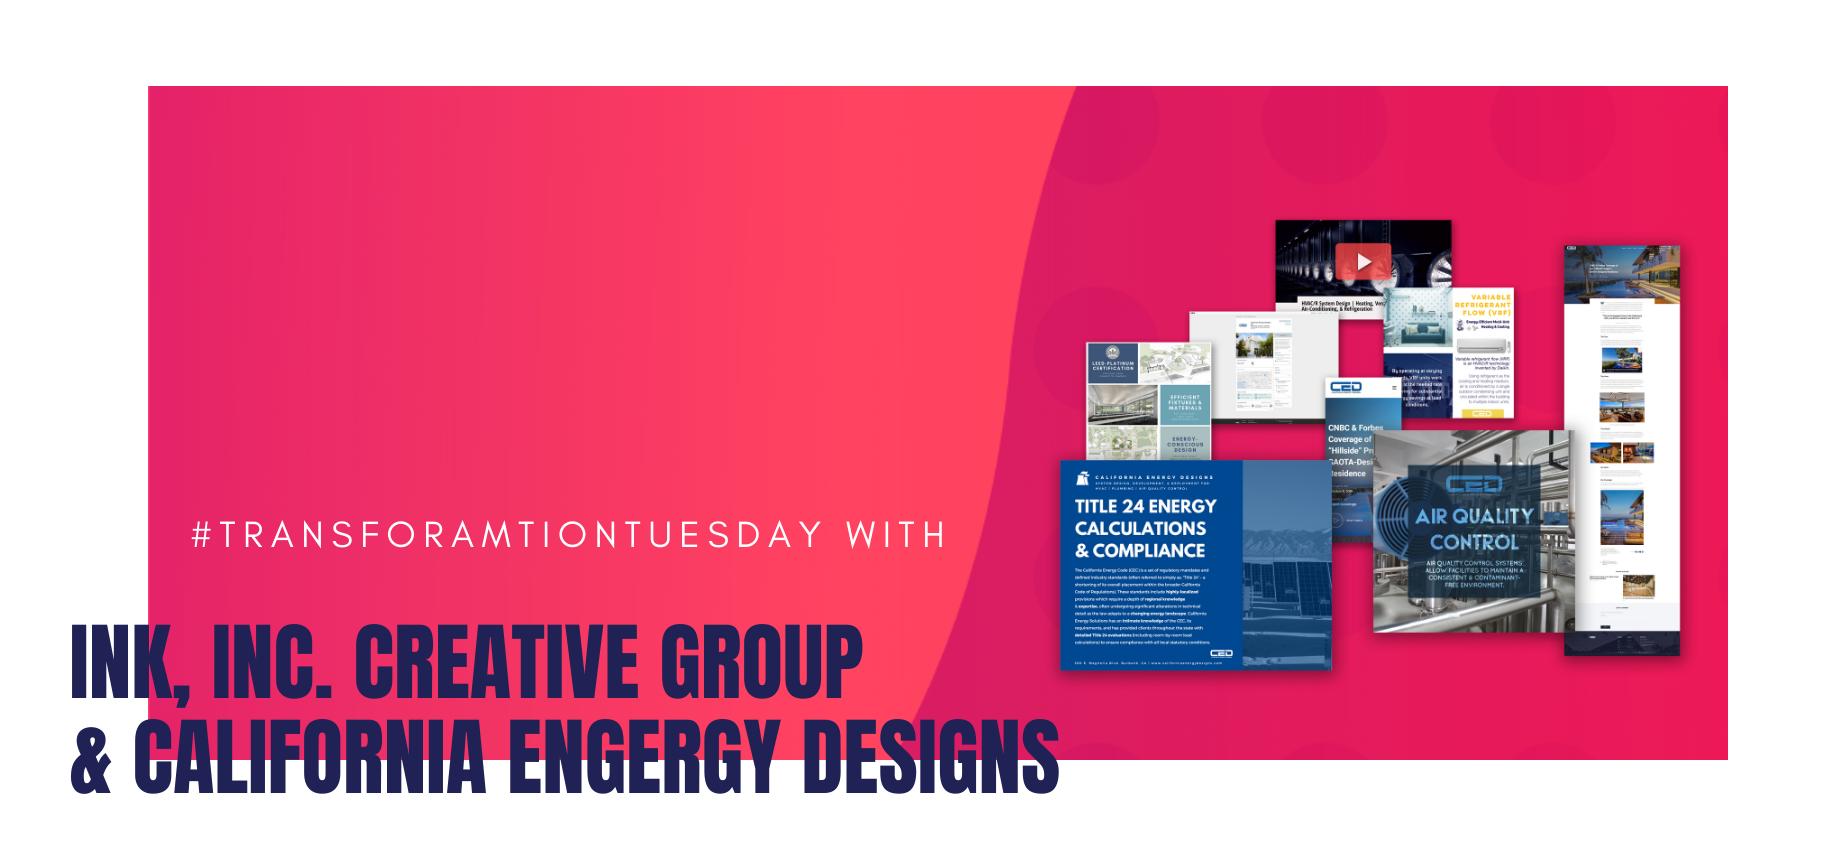 AgencyVista_TransformationTuesday_Ink,Inc.CreativeGroup_2-2